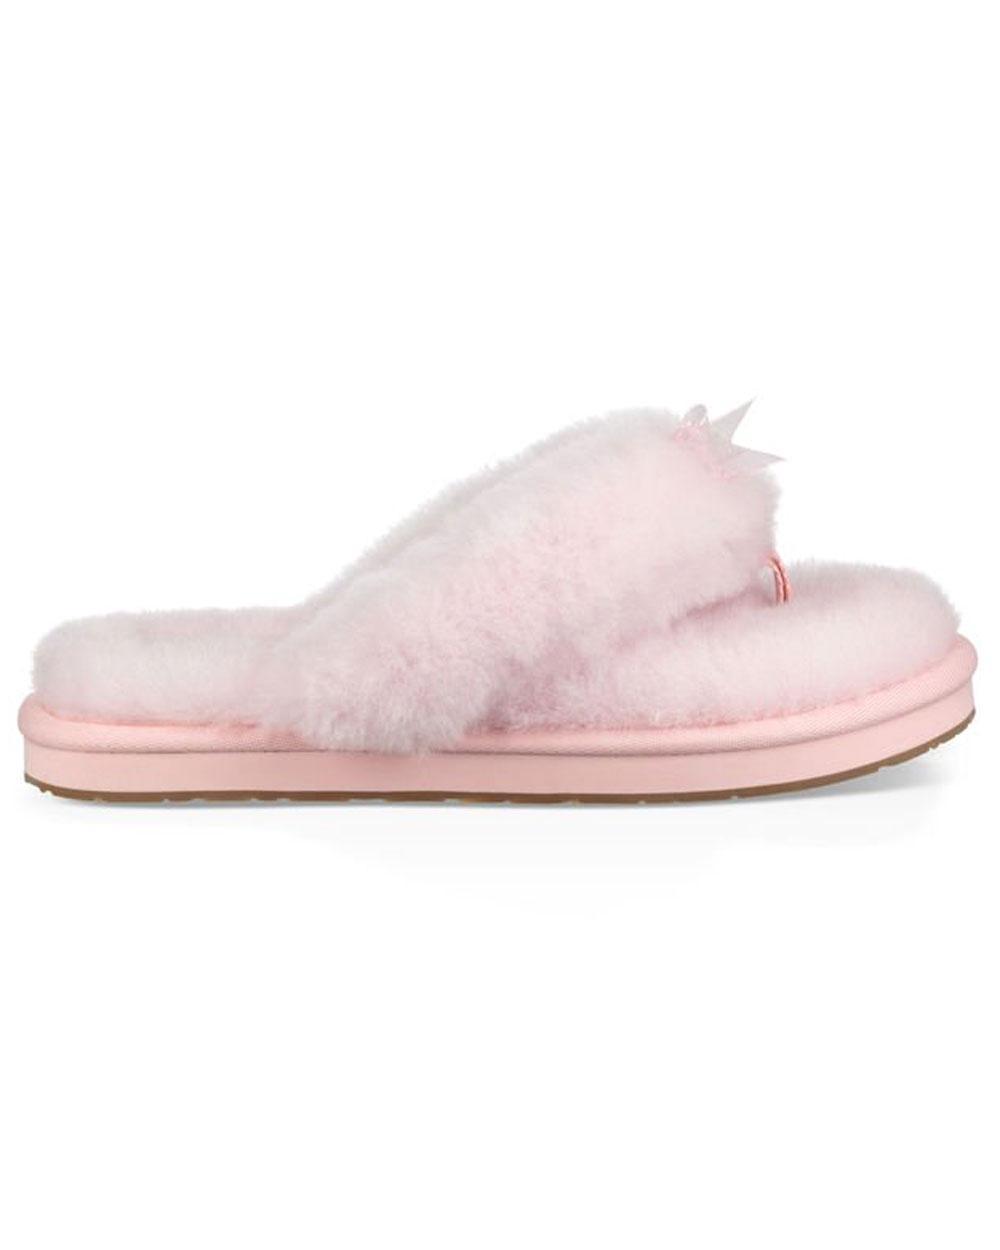 0bbf5fa5f640 Lyst - UGG Seashell Pink Fluff Flip Flop in Pink